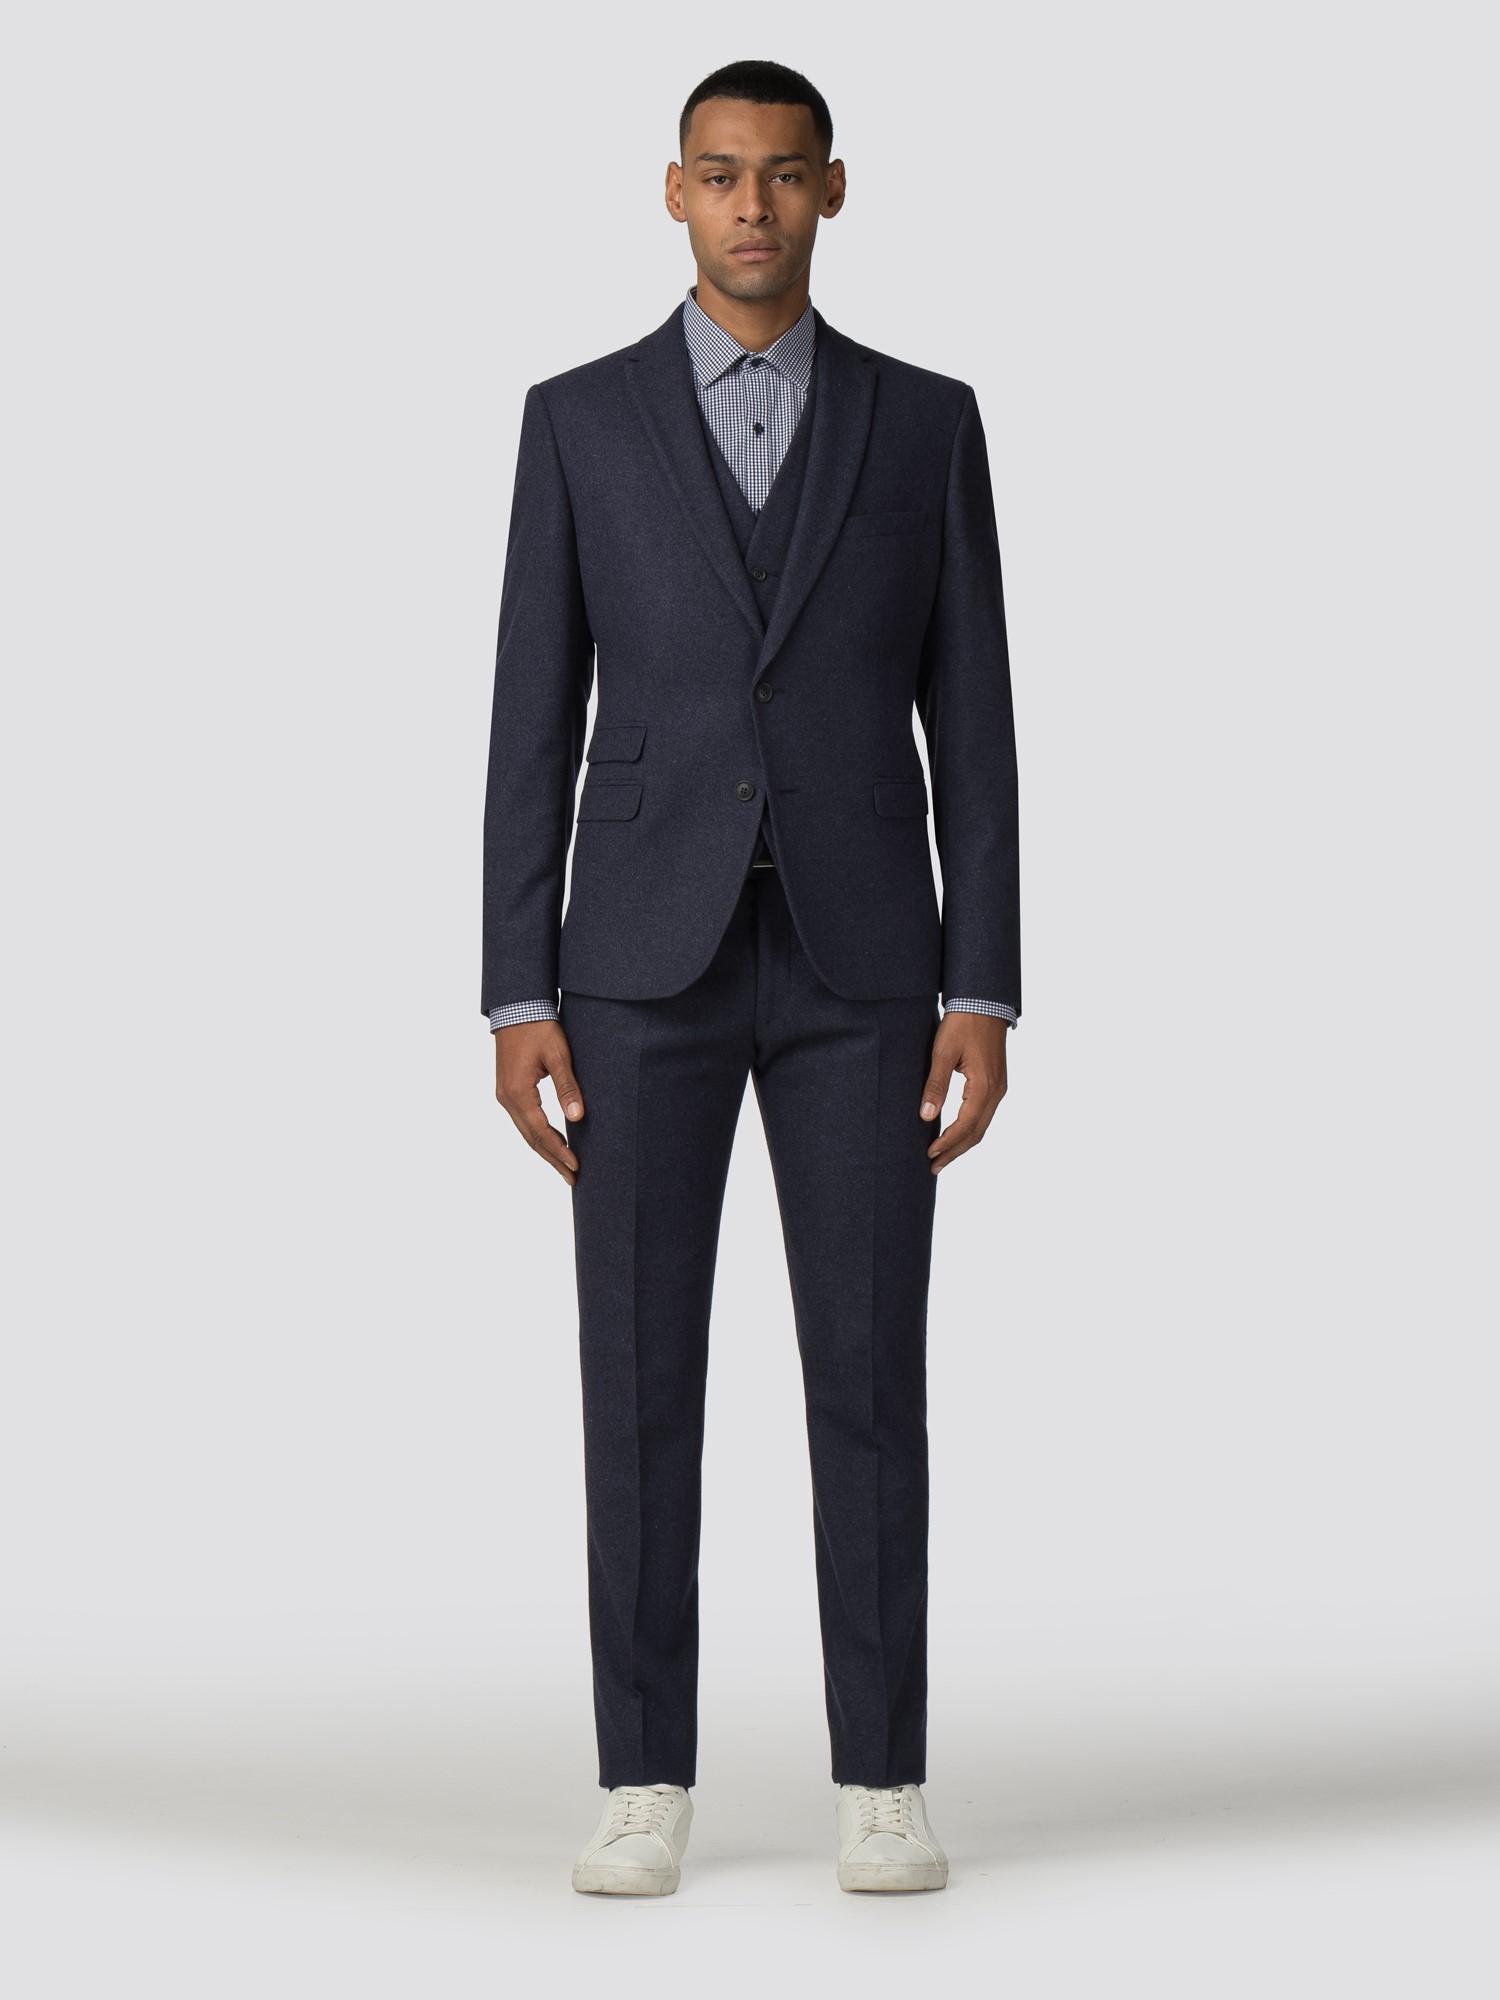 931057c54cc Men's Blue Tweed Skinny Fit Blazer   Ben Sherman   Est 1963